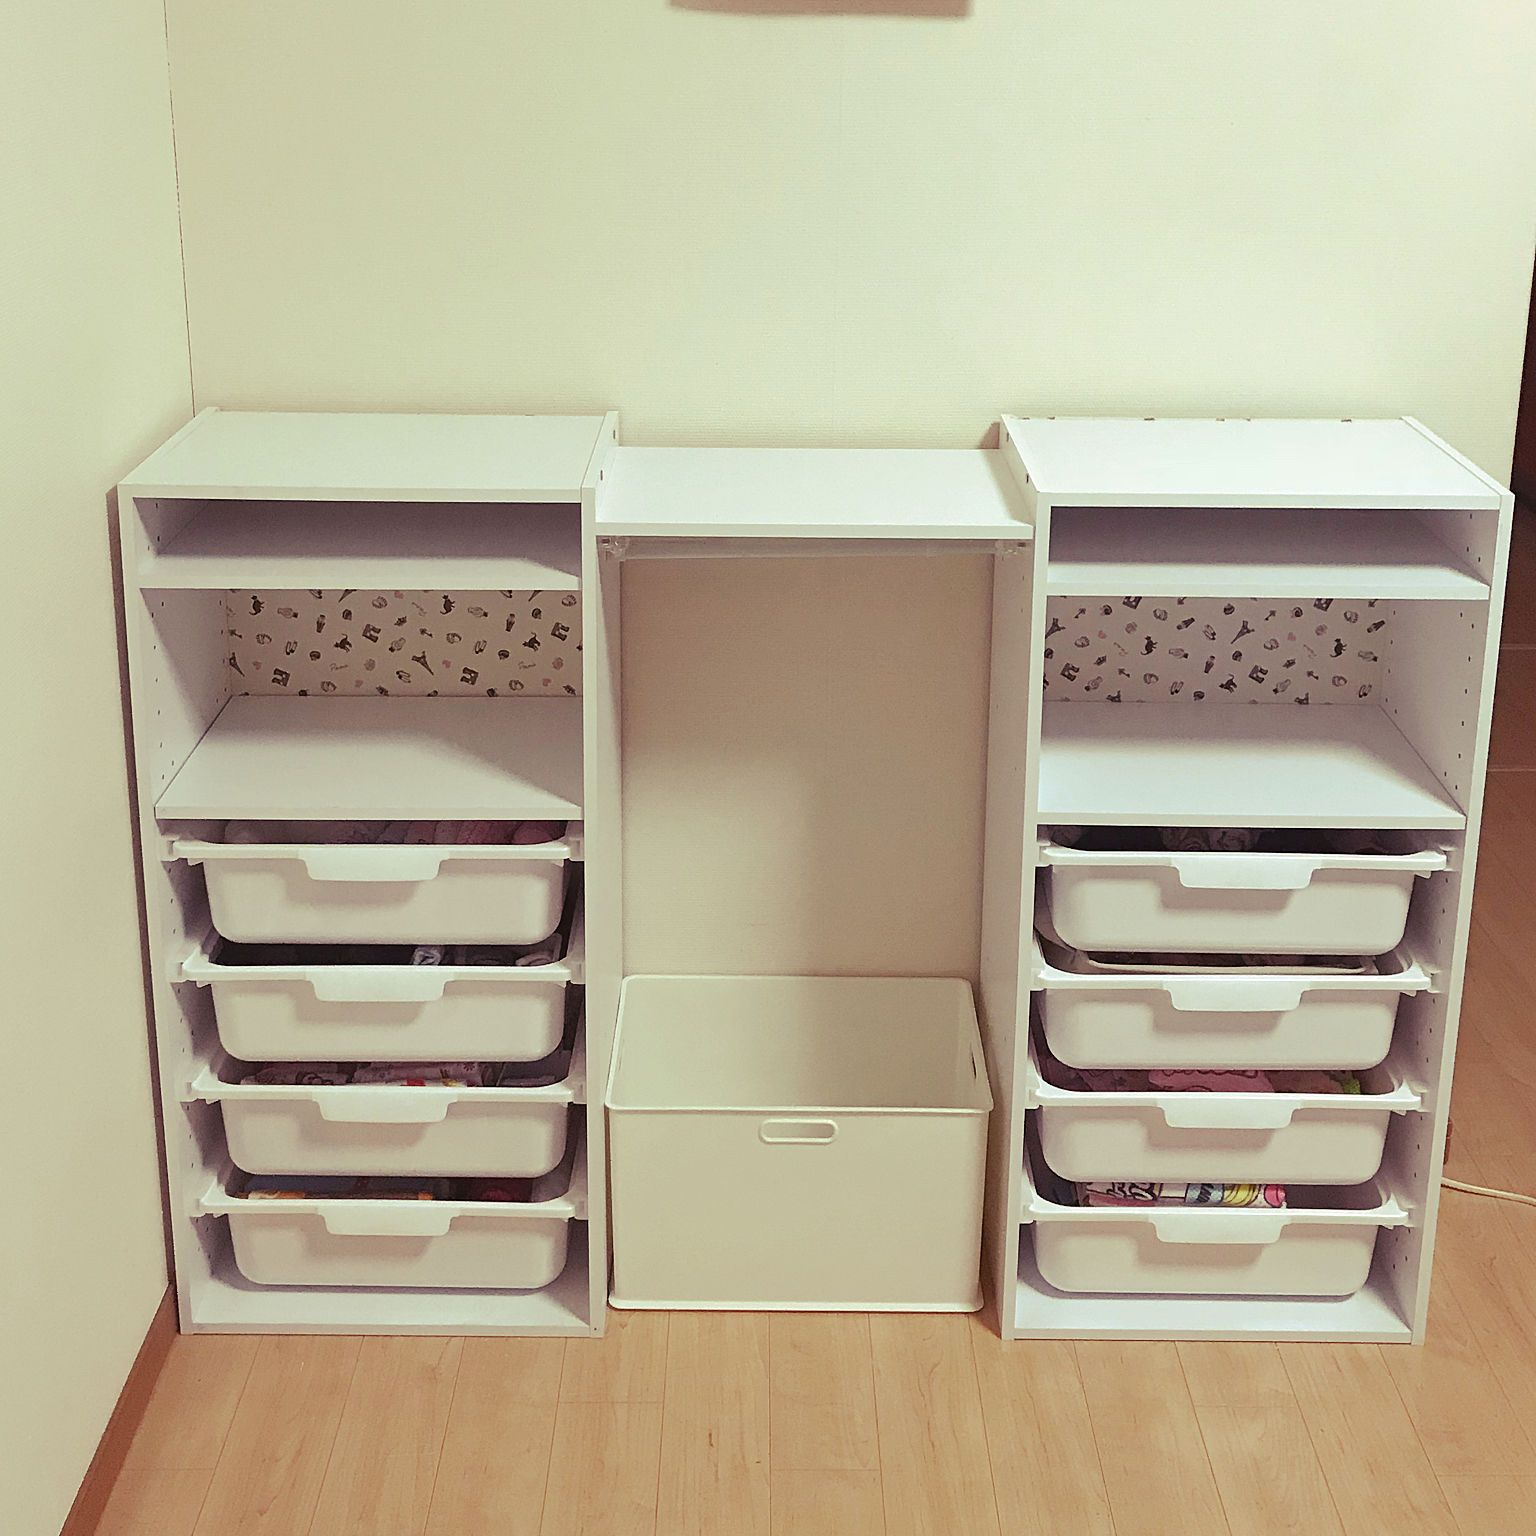 3396c4205 My Shelf/カラーボックス/ニトリ/ニトリのカラーボックス/幼稚園グッズ 収納